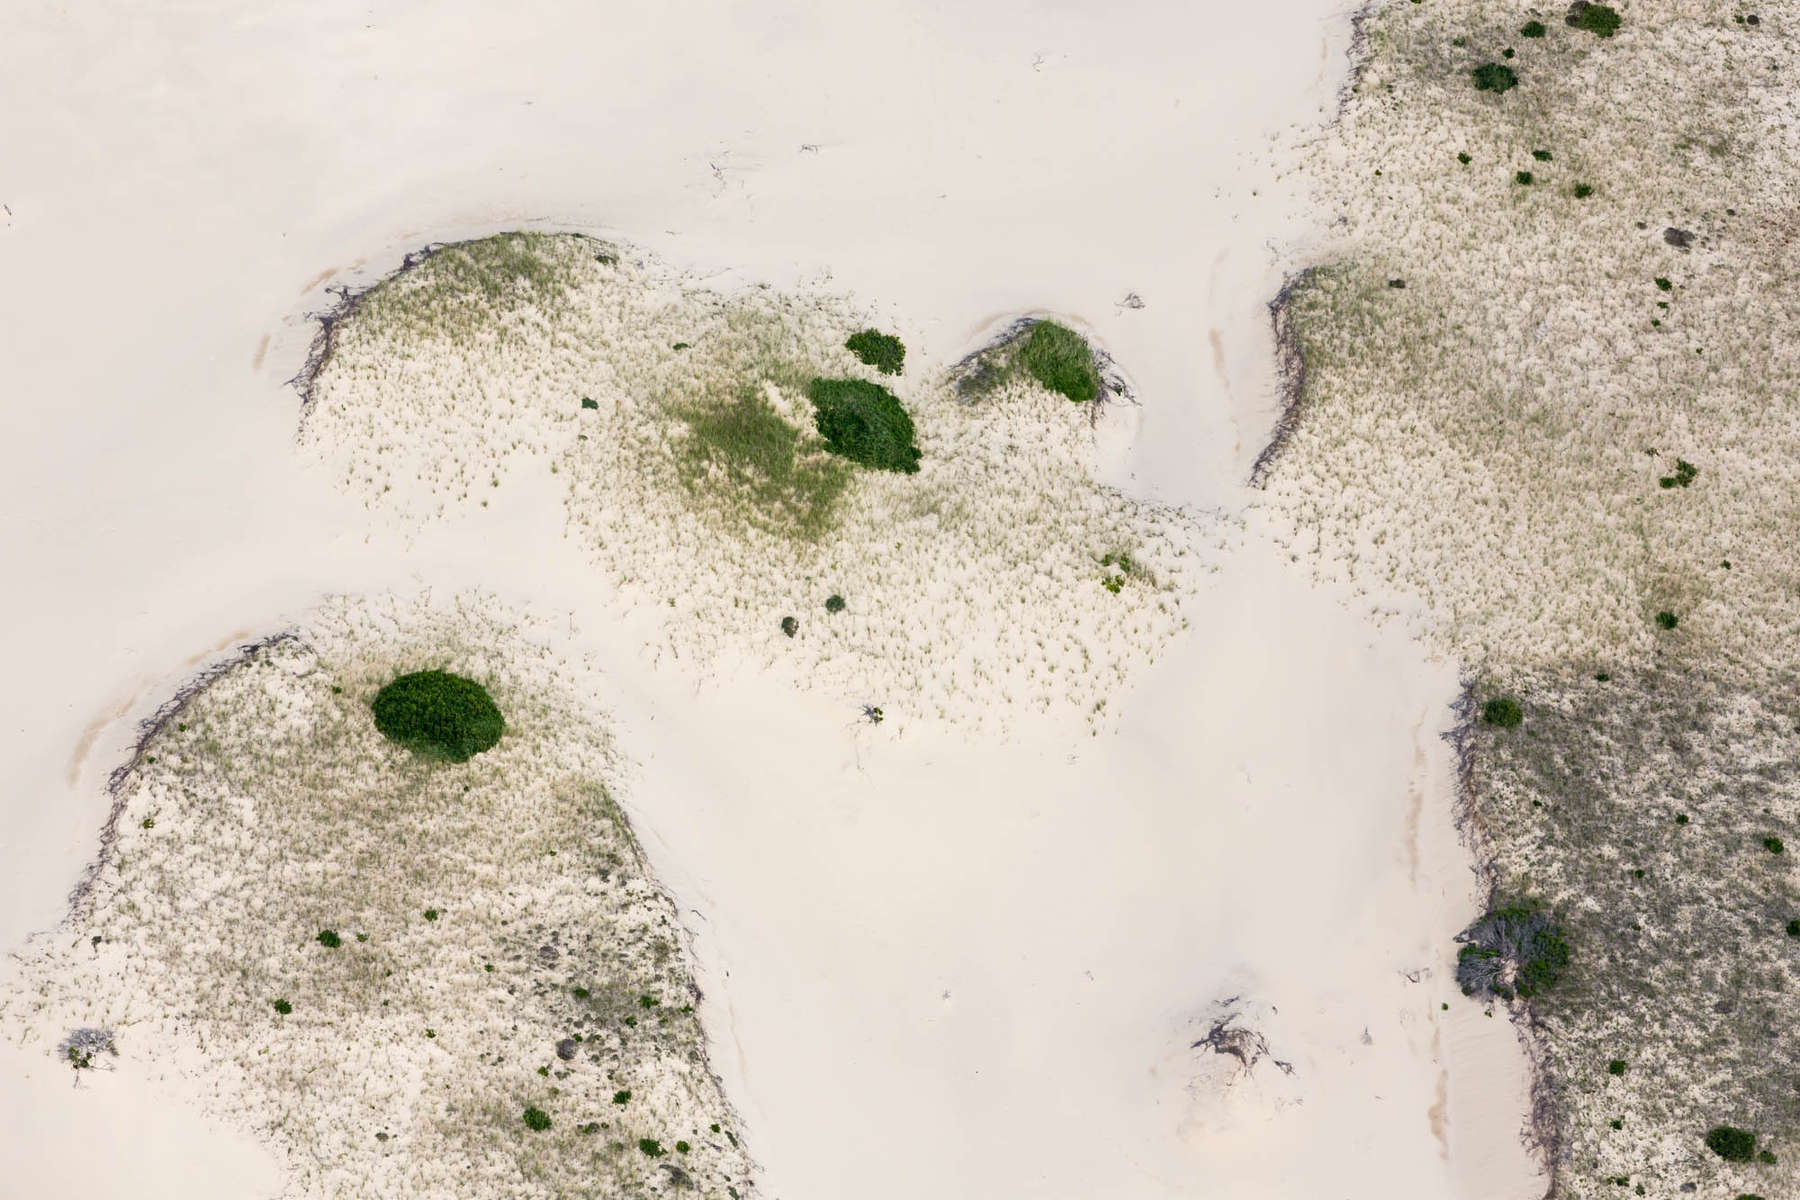 Incipient Foredunes, Cape Cod, MA 2013 (130721-0277)Dunes, beach, ocean, island, vegetation, sand, green